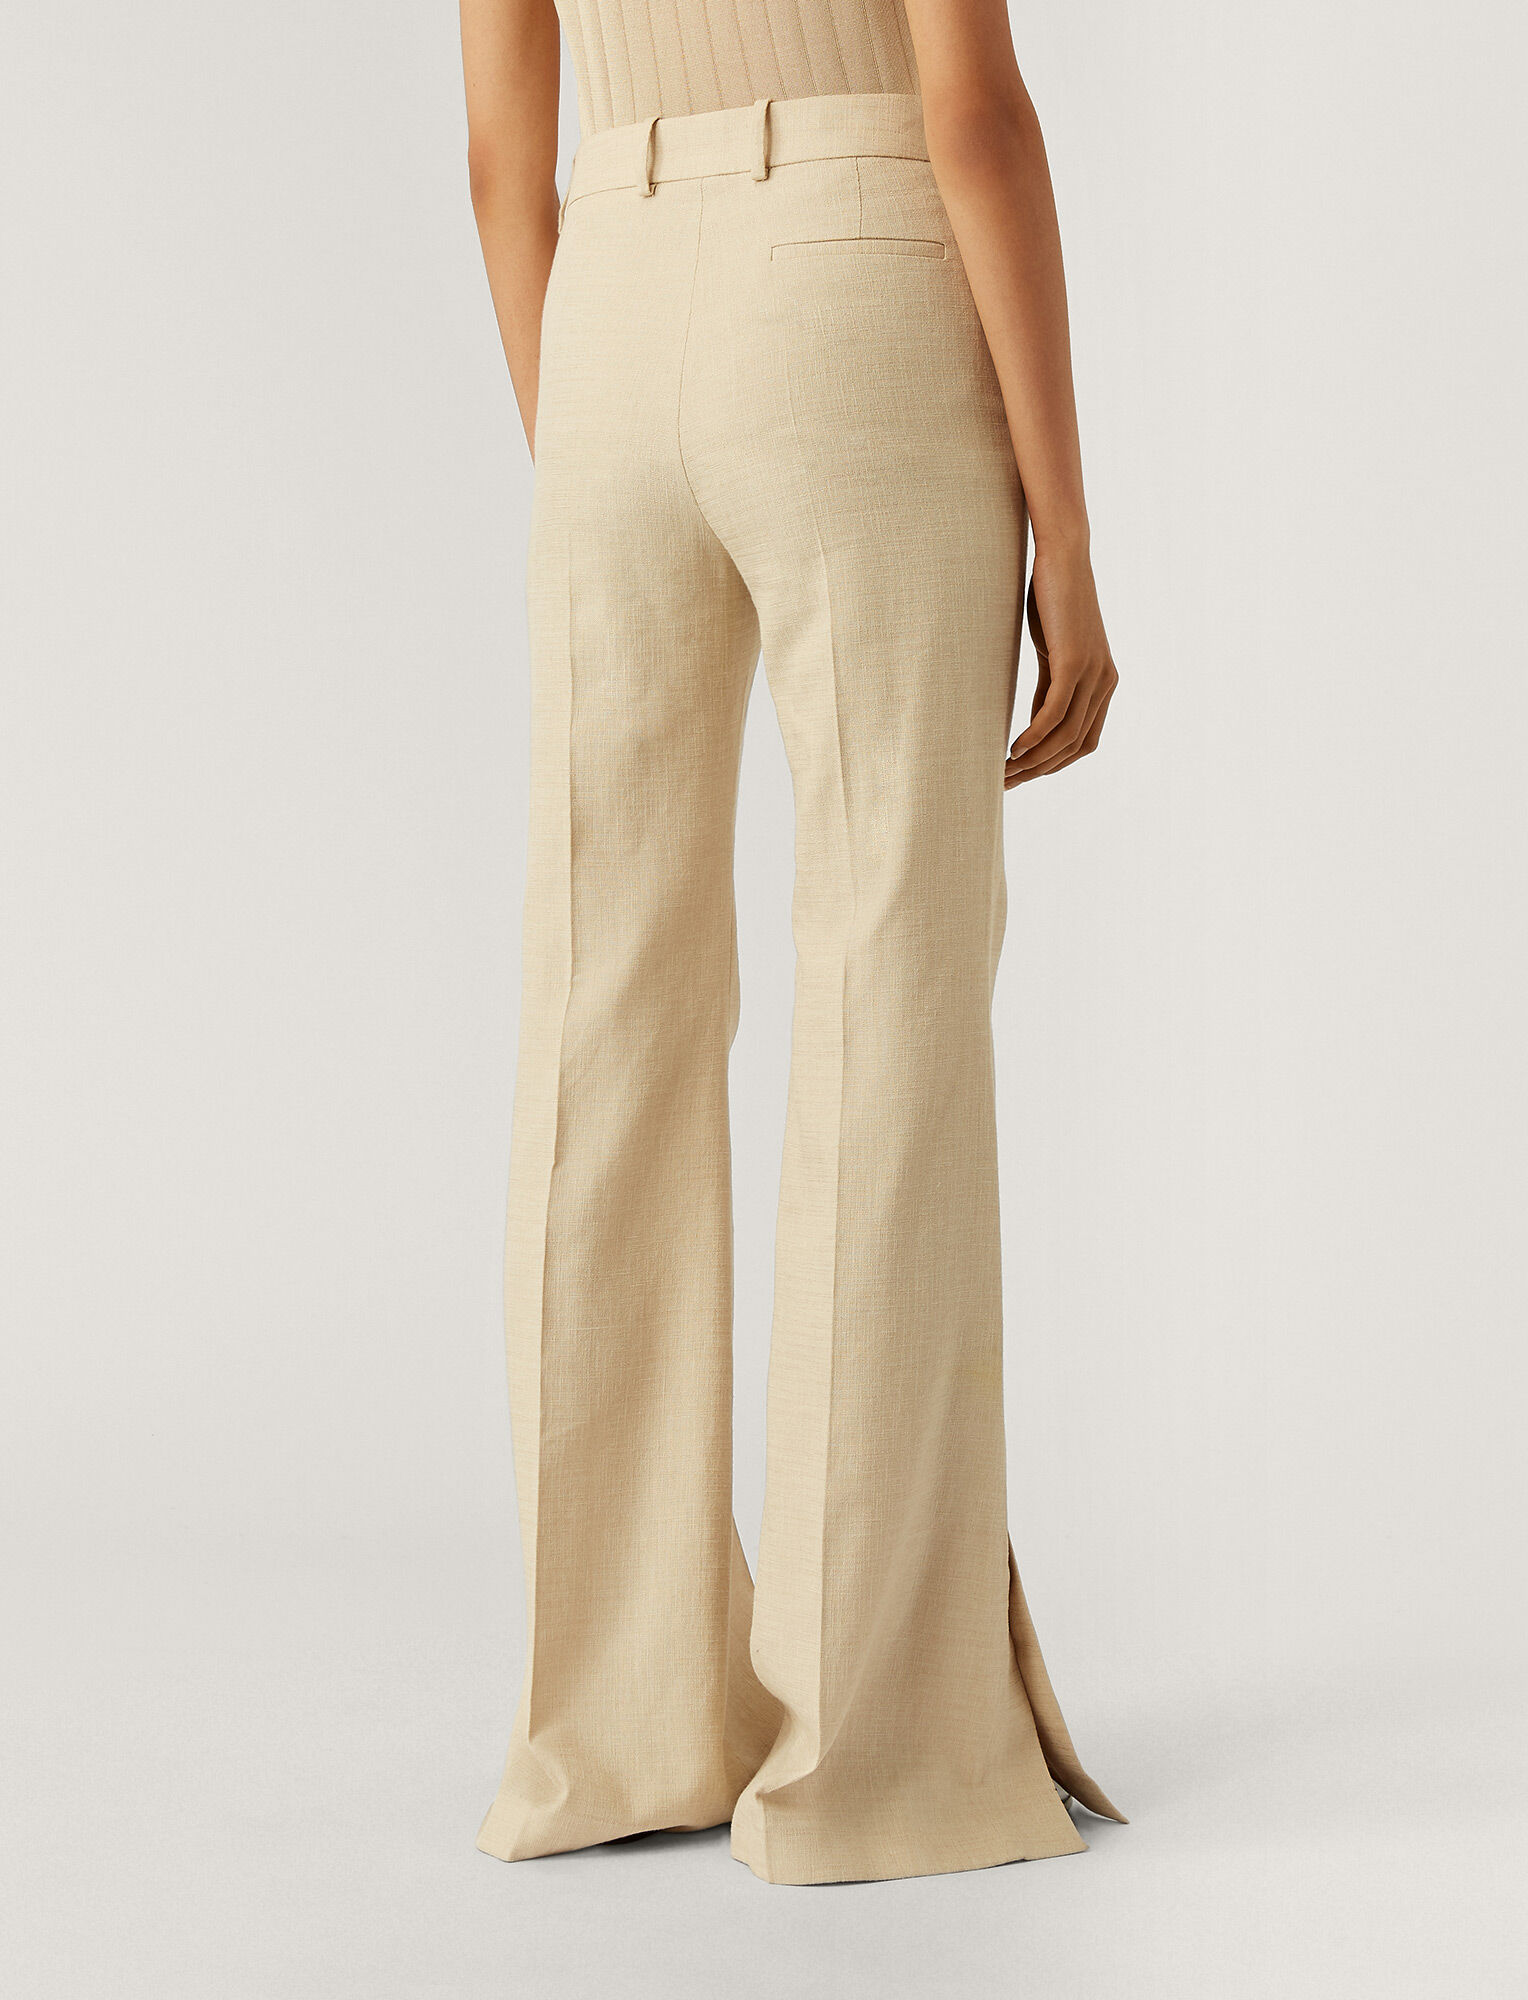 Joseph, Tena Shantung Linen Trousers, in STRAW